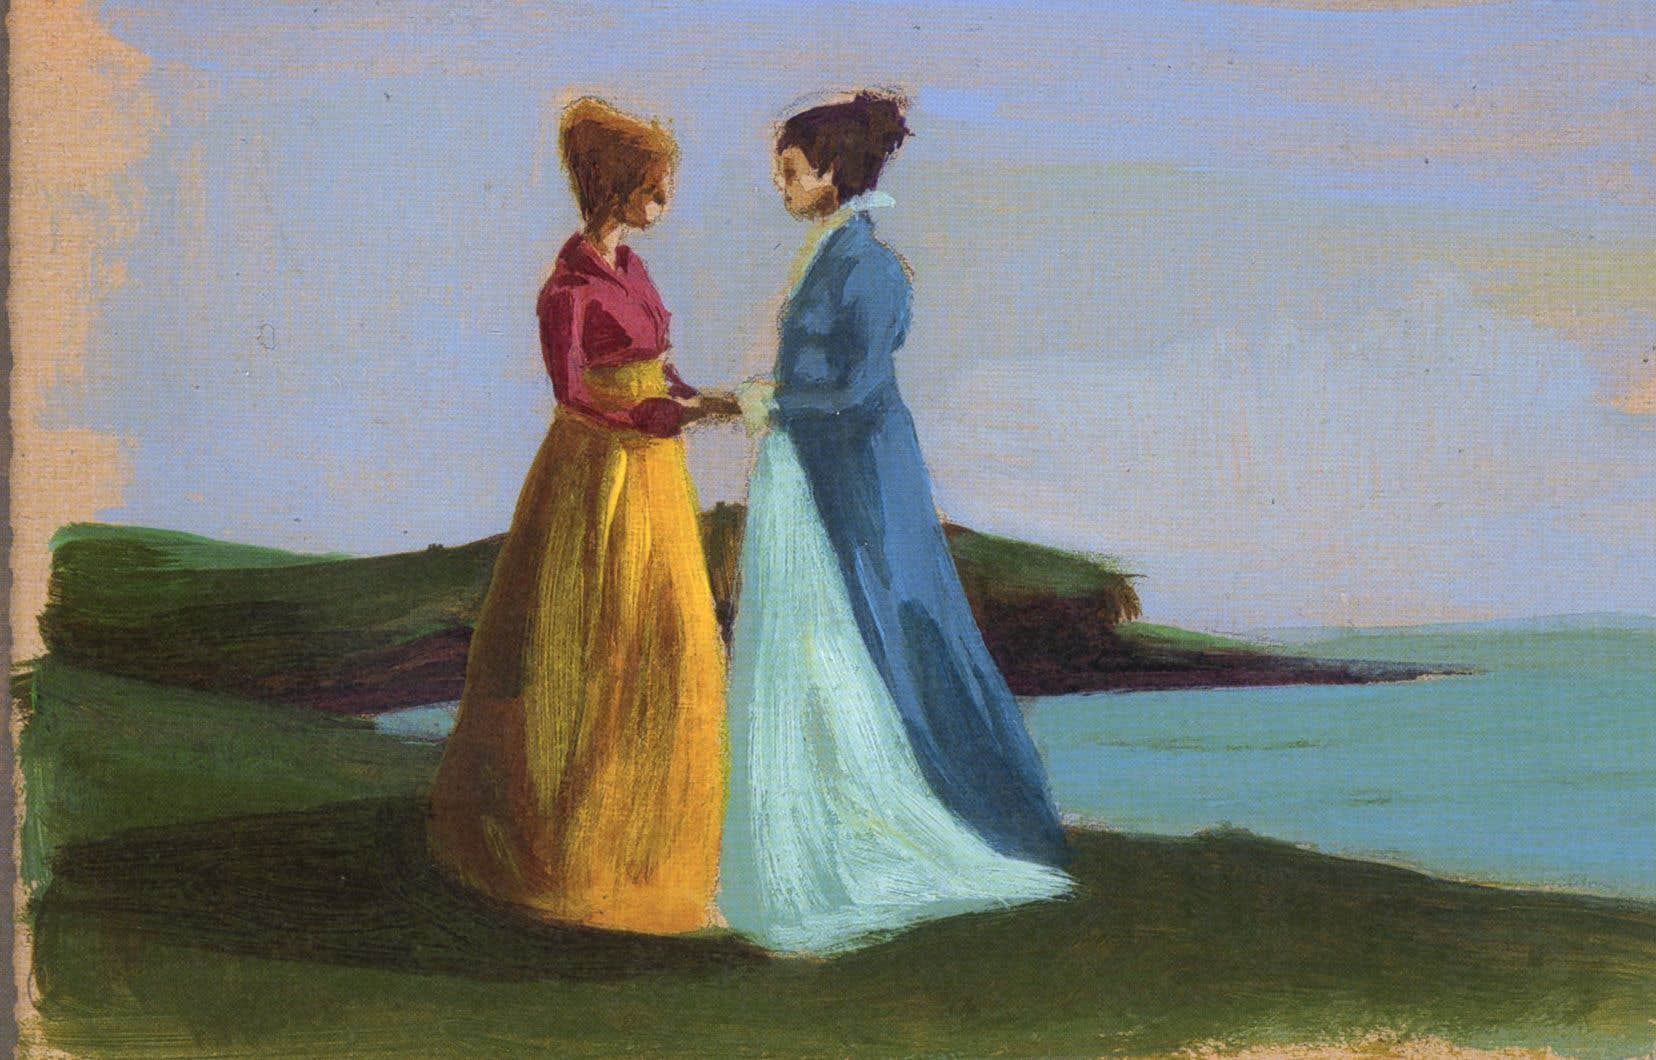 Les sœurs Elinor et Marianne Dashwood